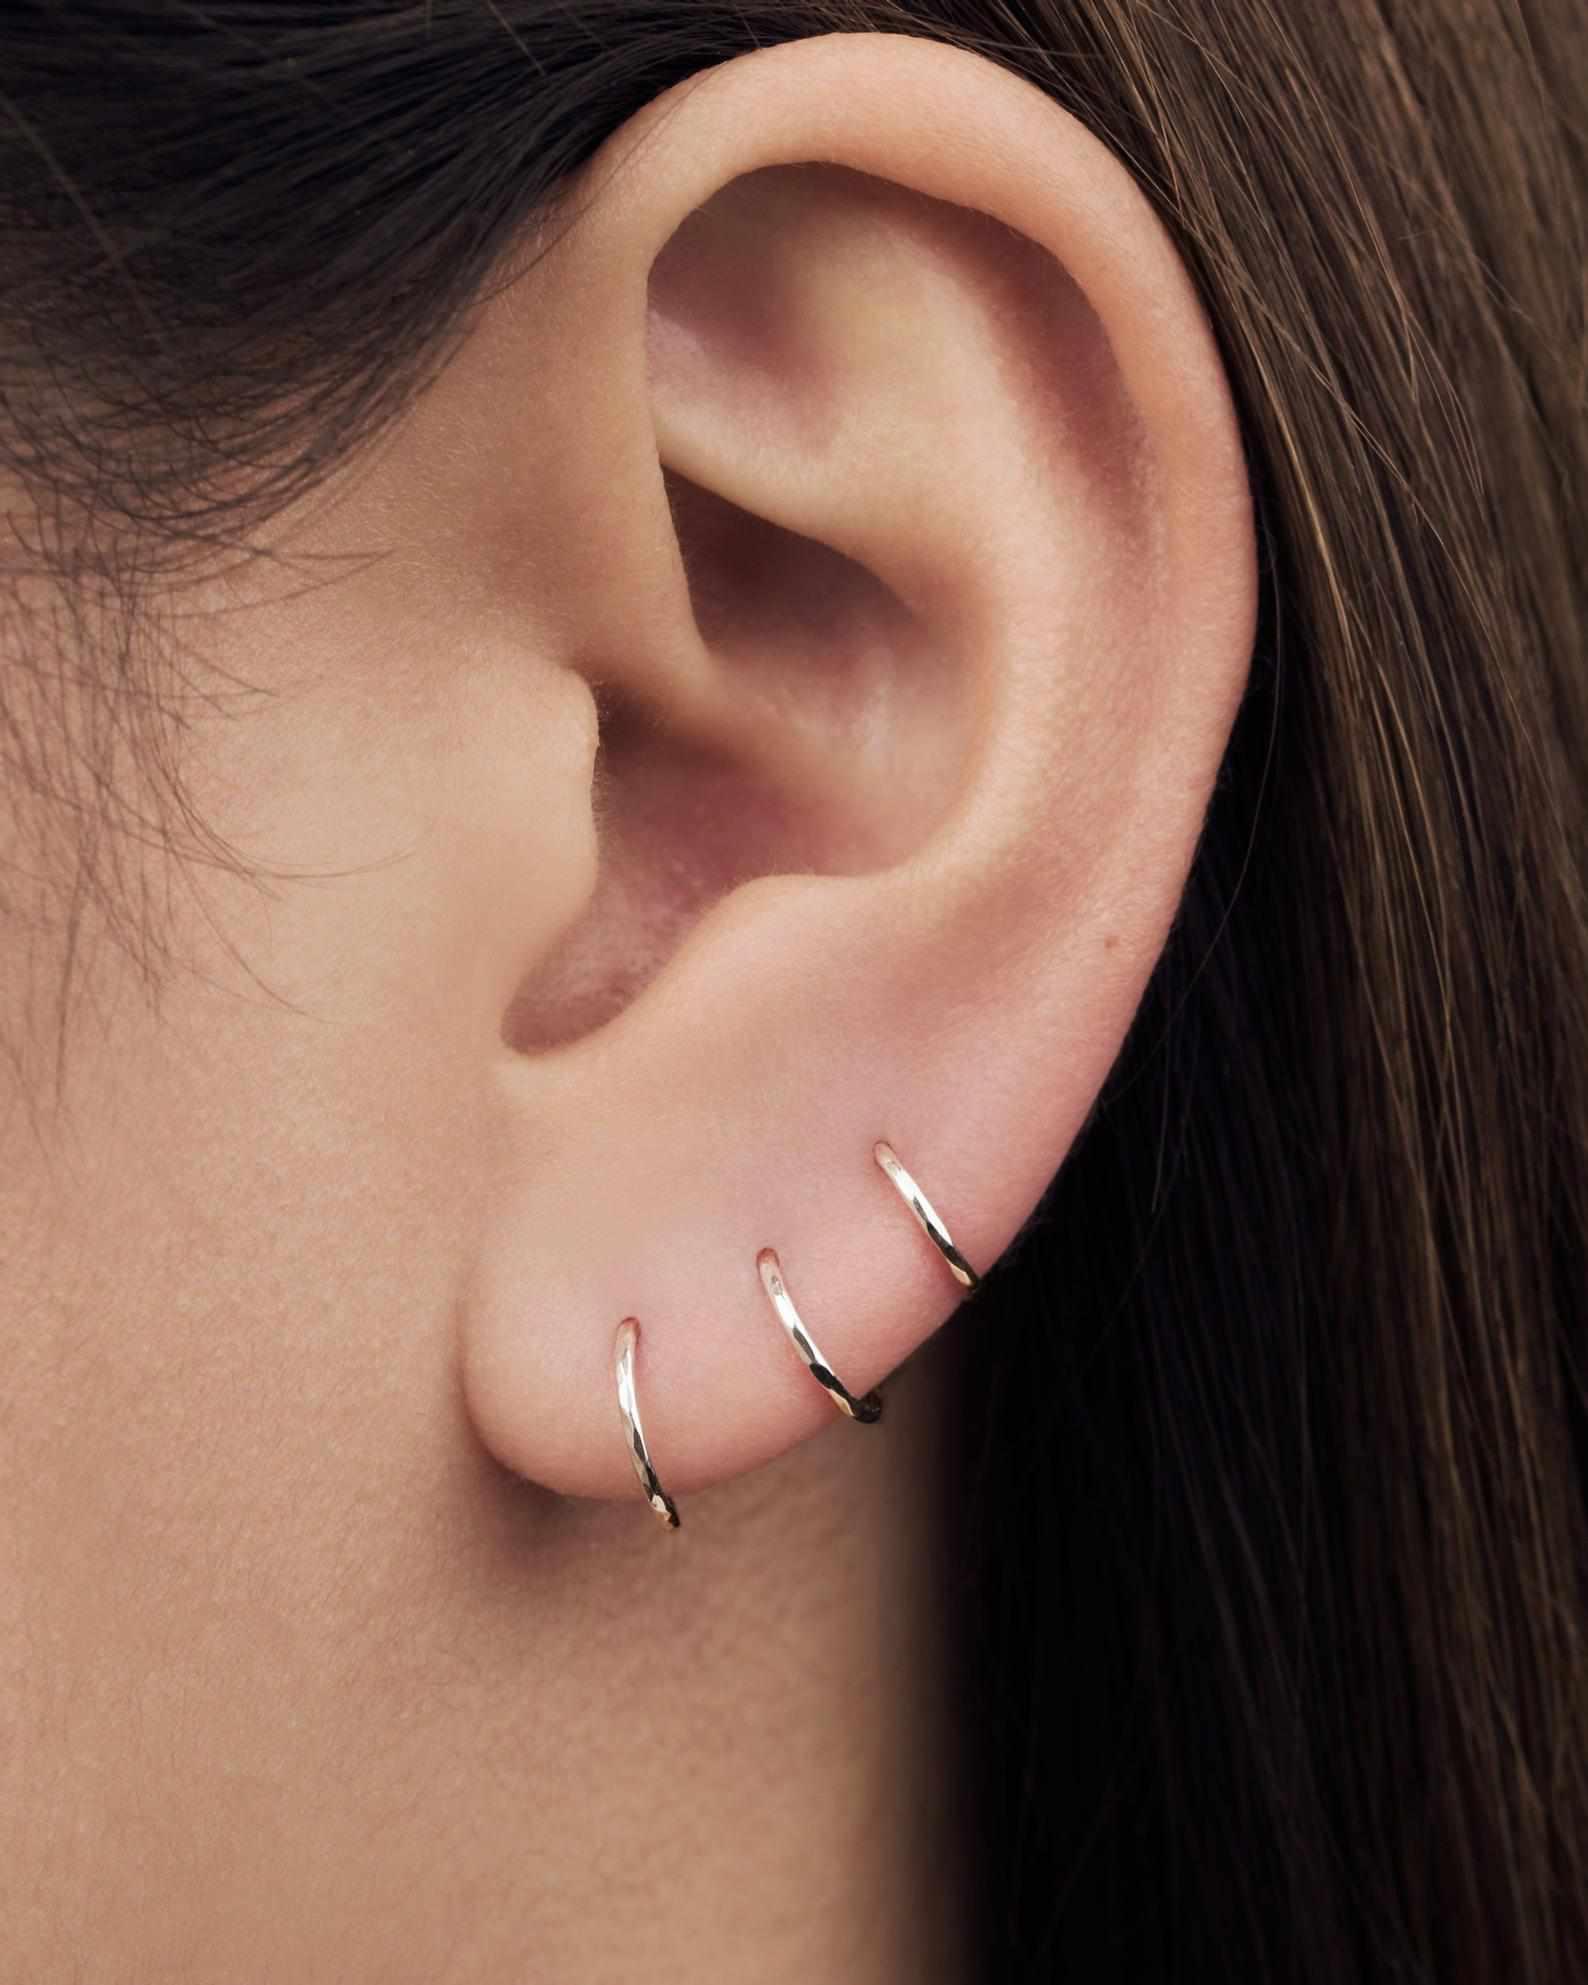 https://www.etsy.com/listing/698070485/cartilage-earrings-tiny-hoop-earrings